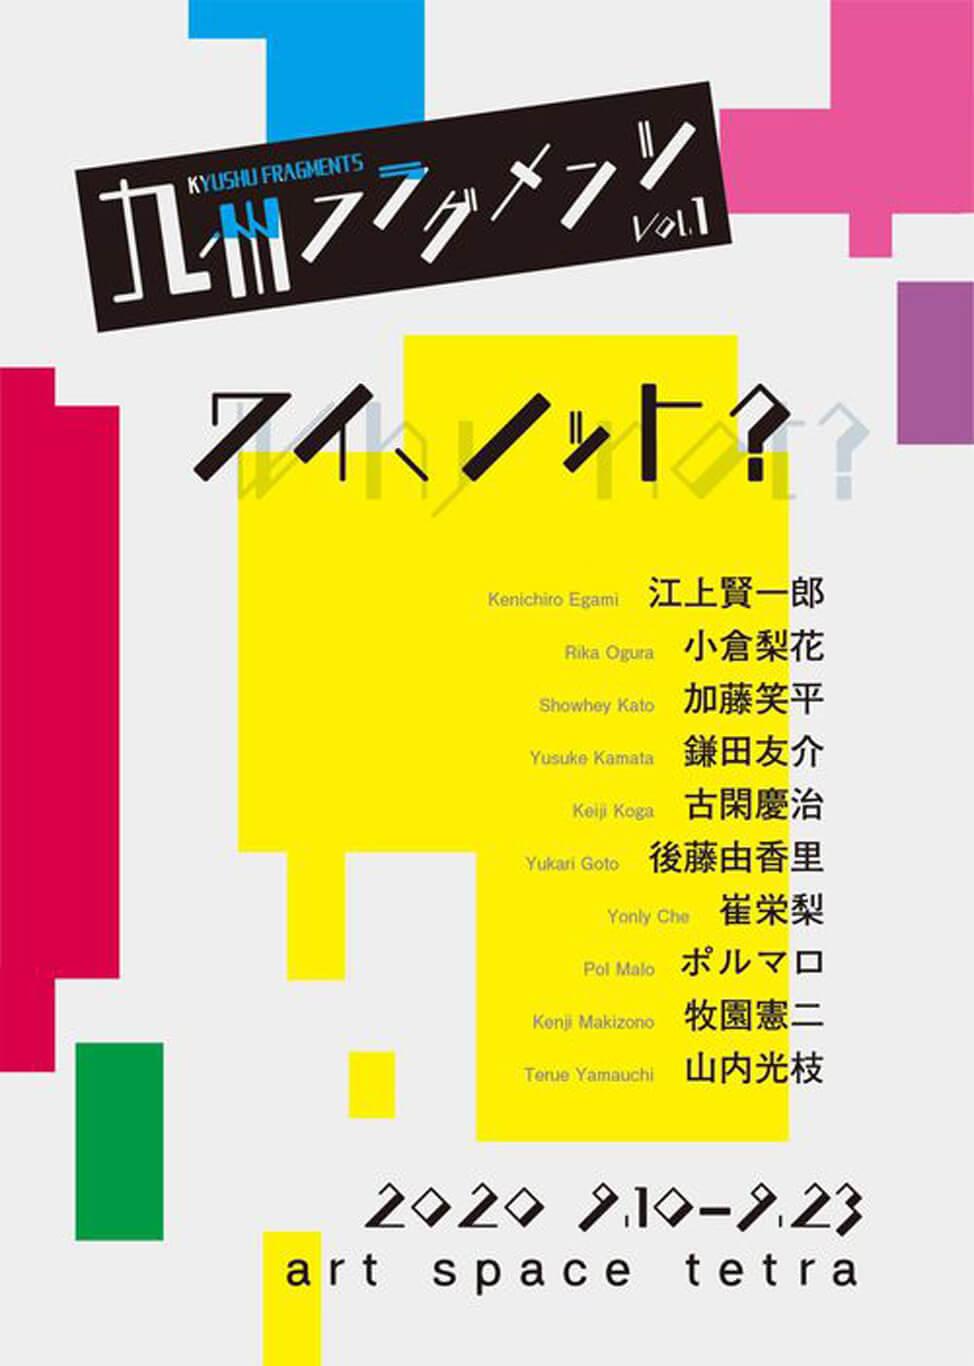 tetra-202009-九州フラグメンツvol.01